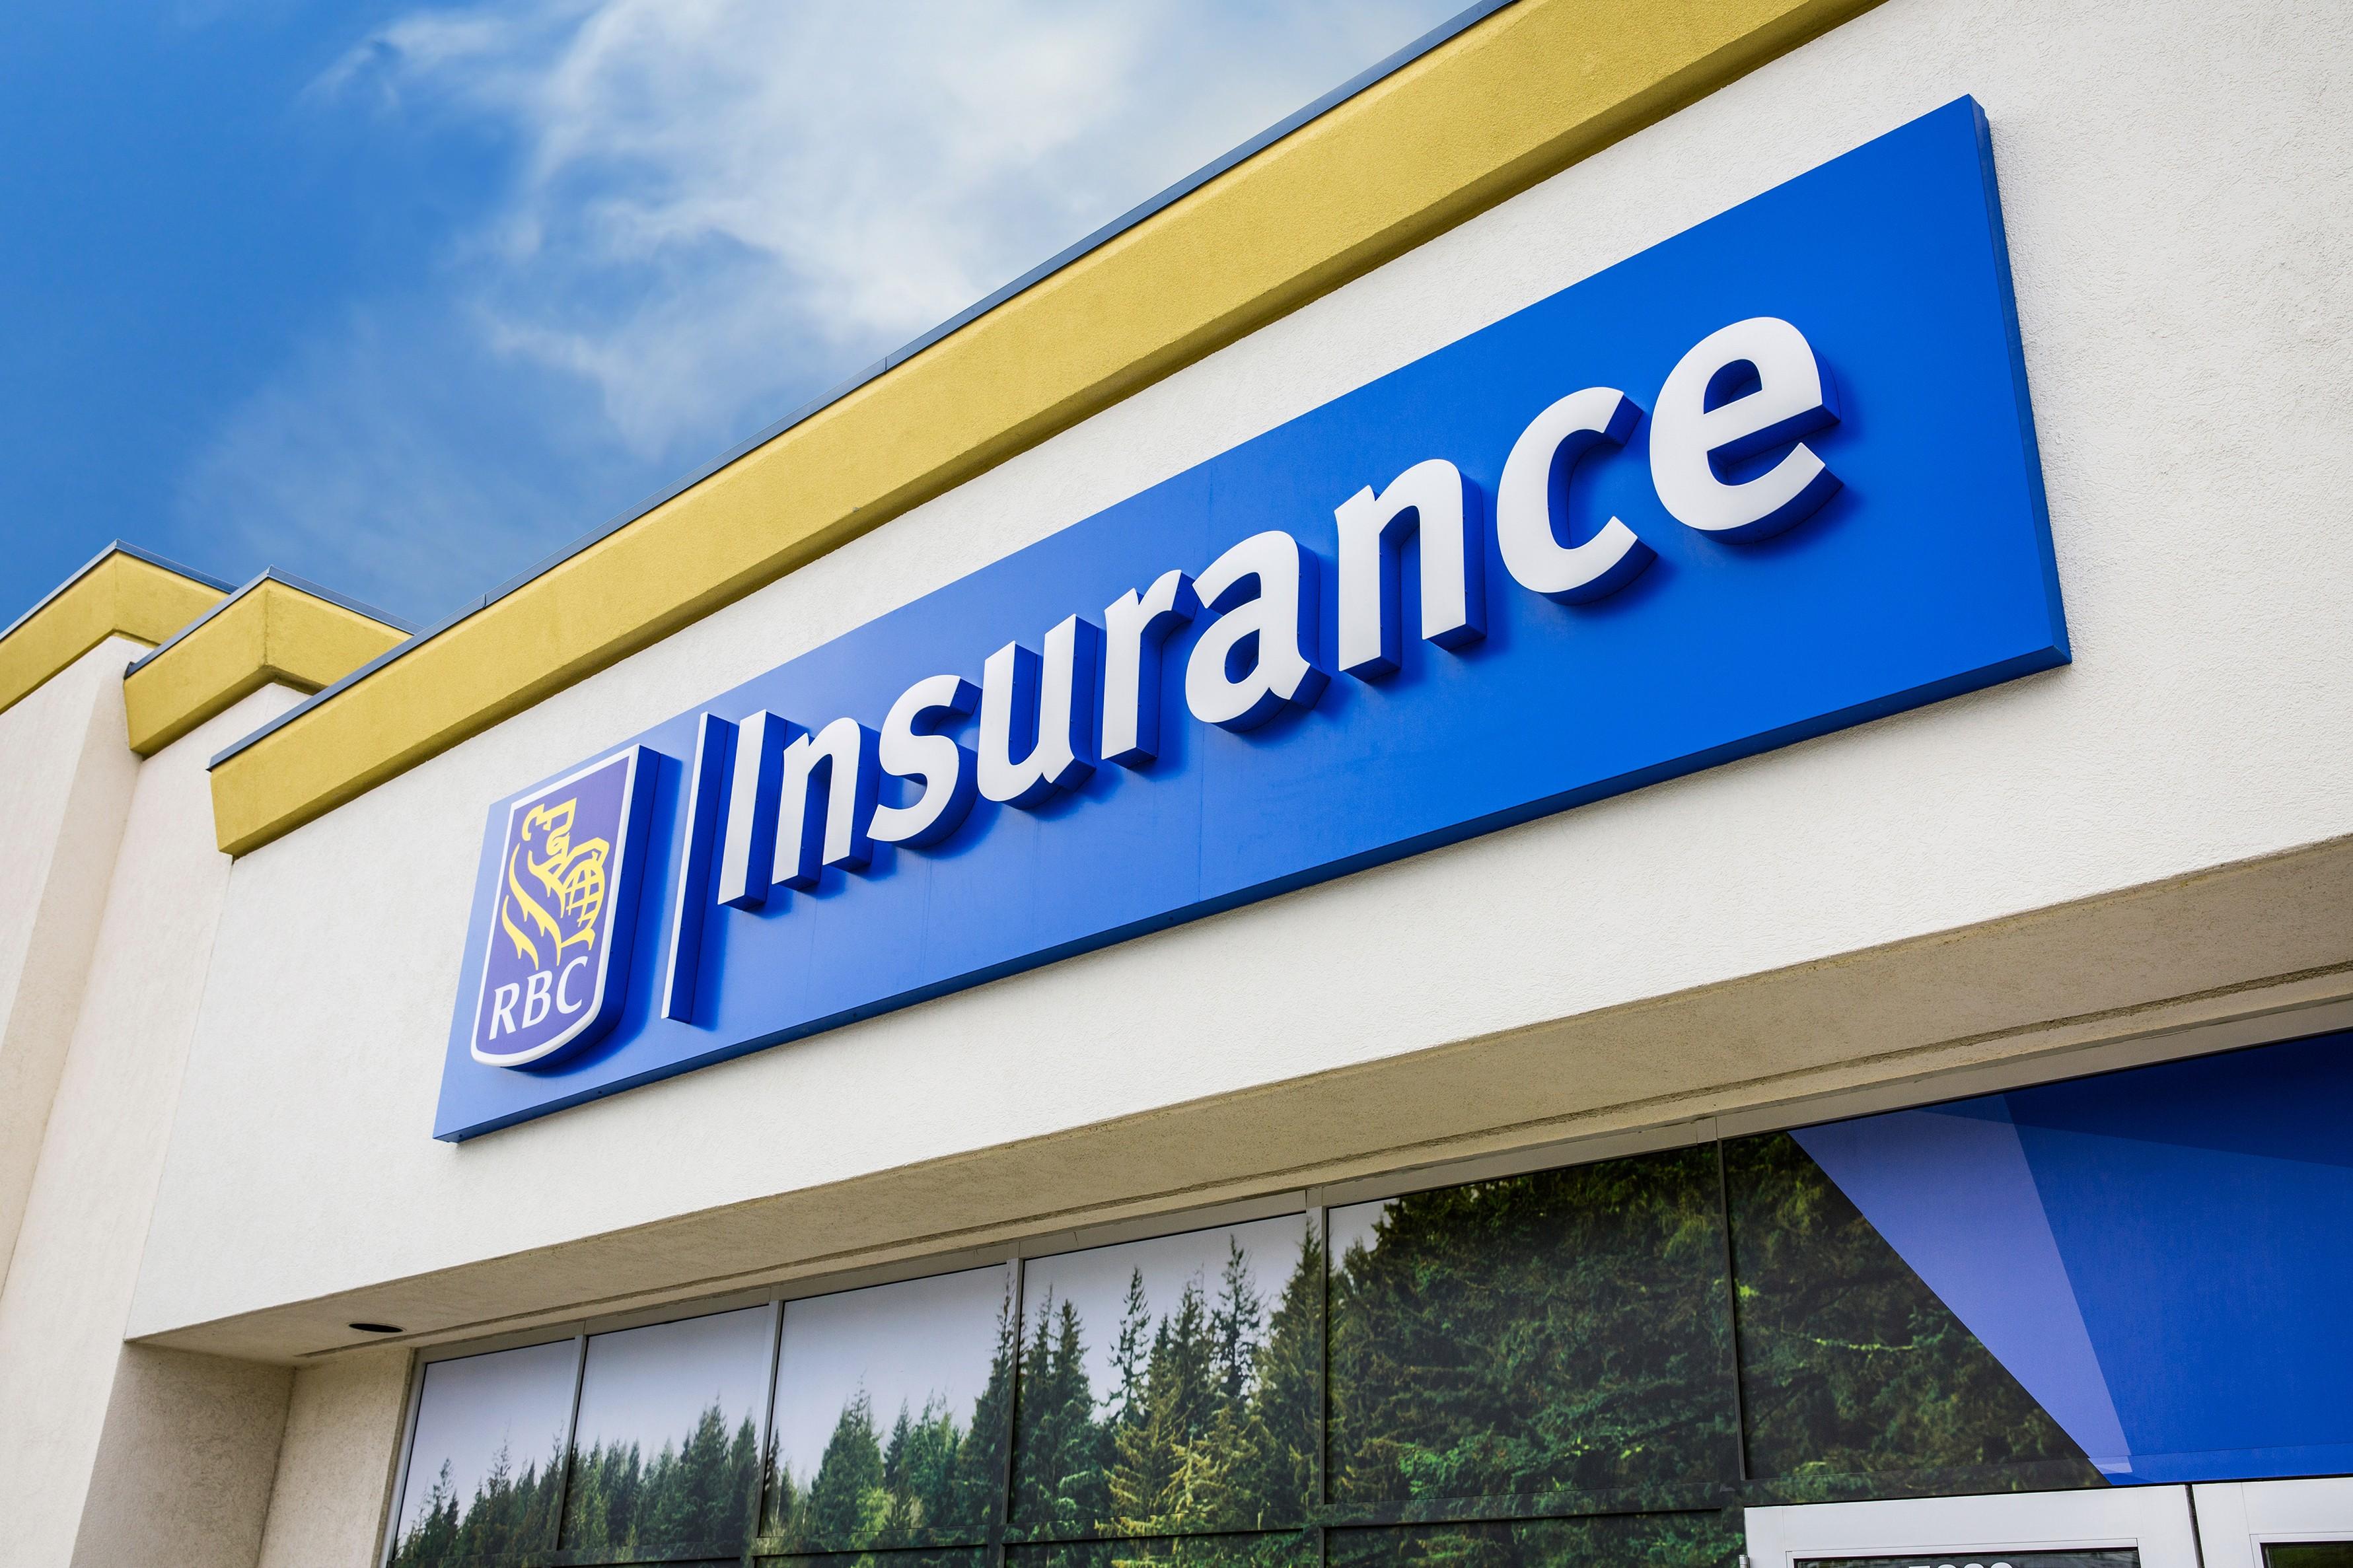 RBC Insurance | LinkedIn